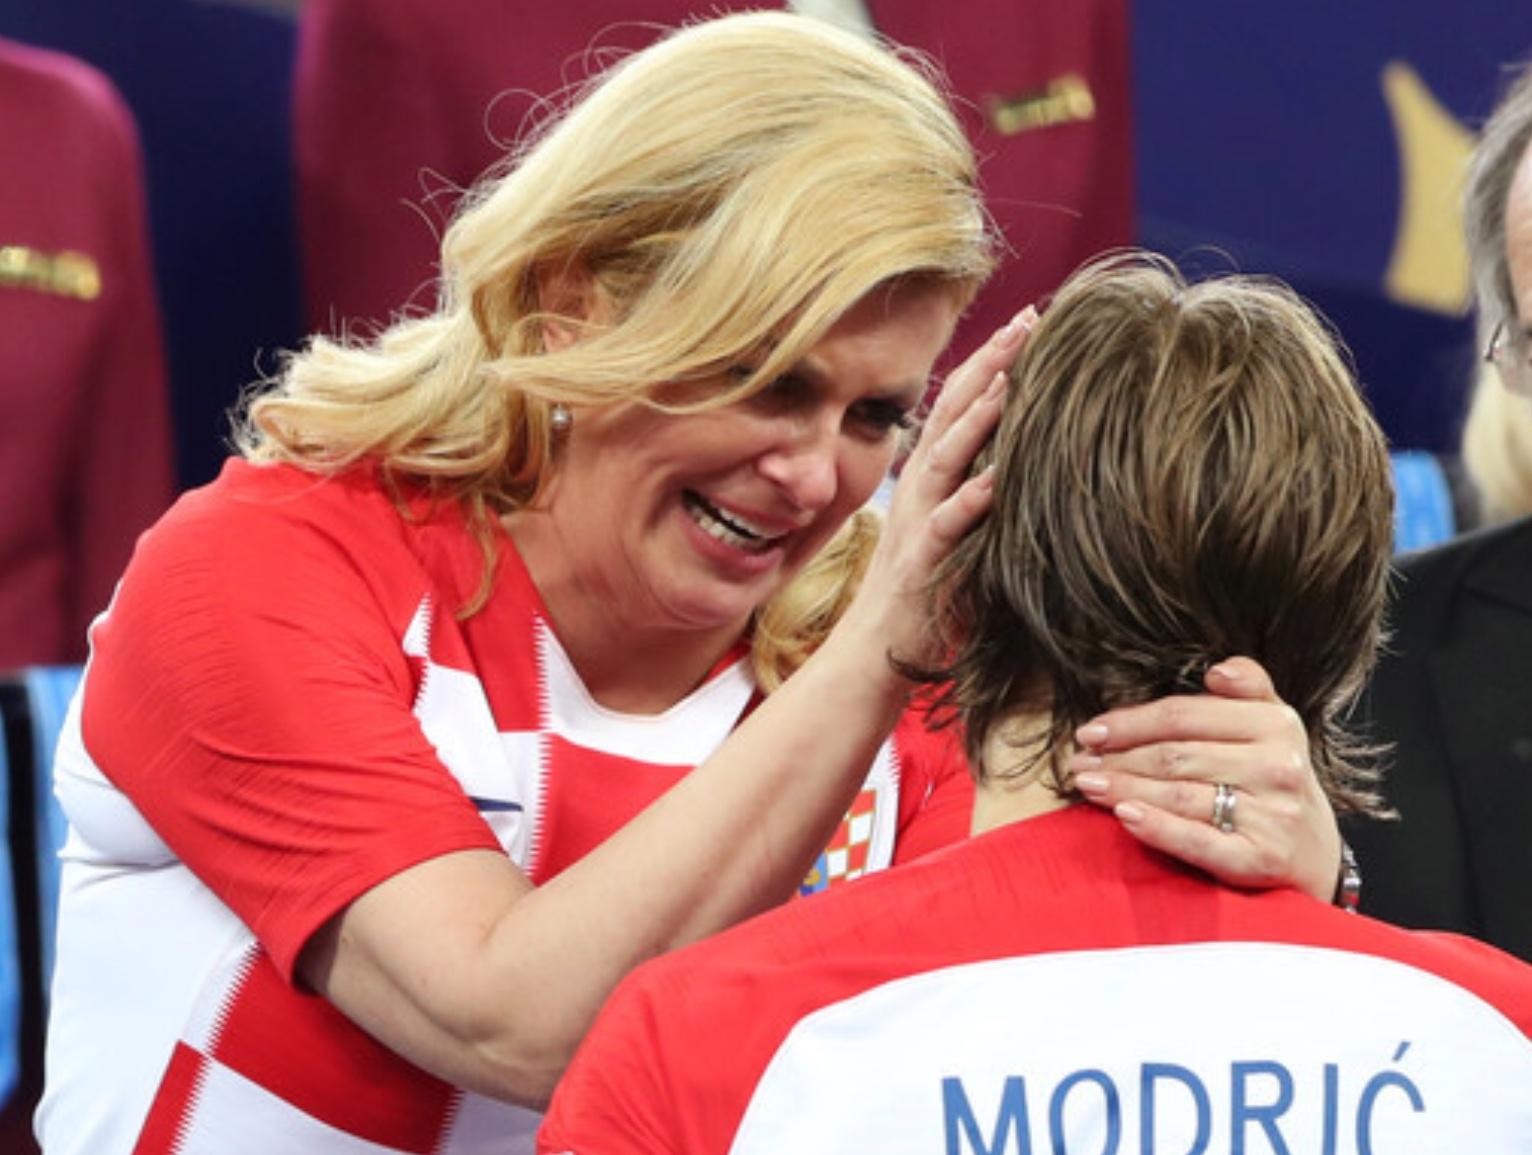 Croatian President Kolinda Grabar-Kitarovic comforts player Luka Modric after Croatia's World Cup Final loss to France.